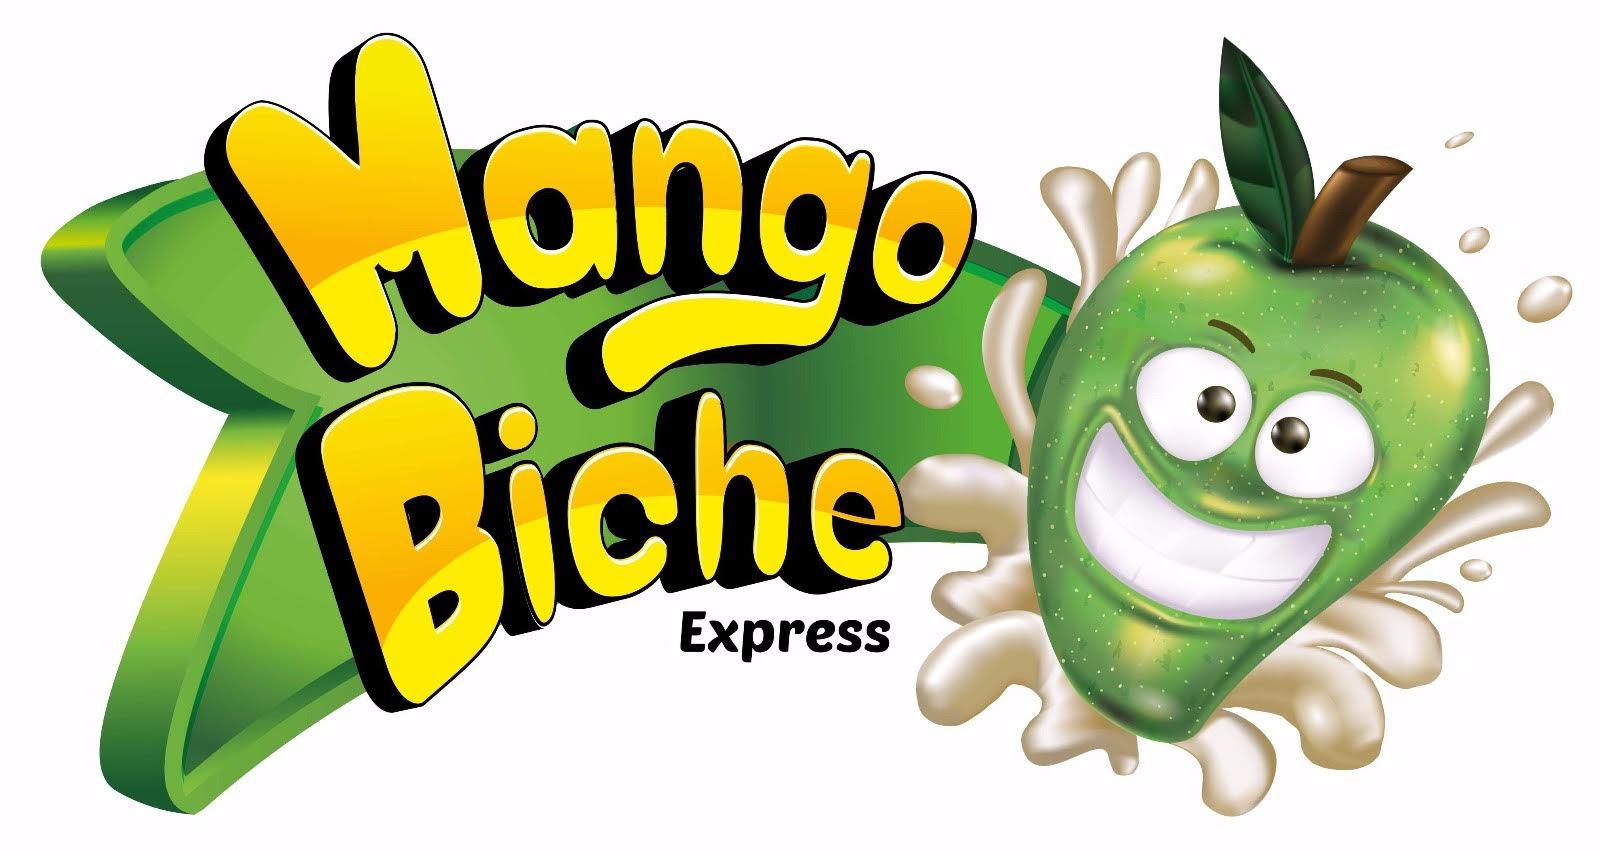 Mango Biche Express CC Aventura Medellin